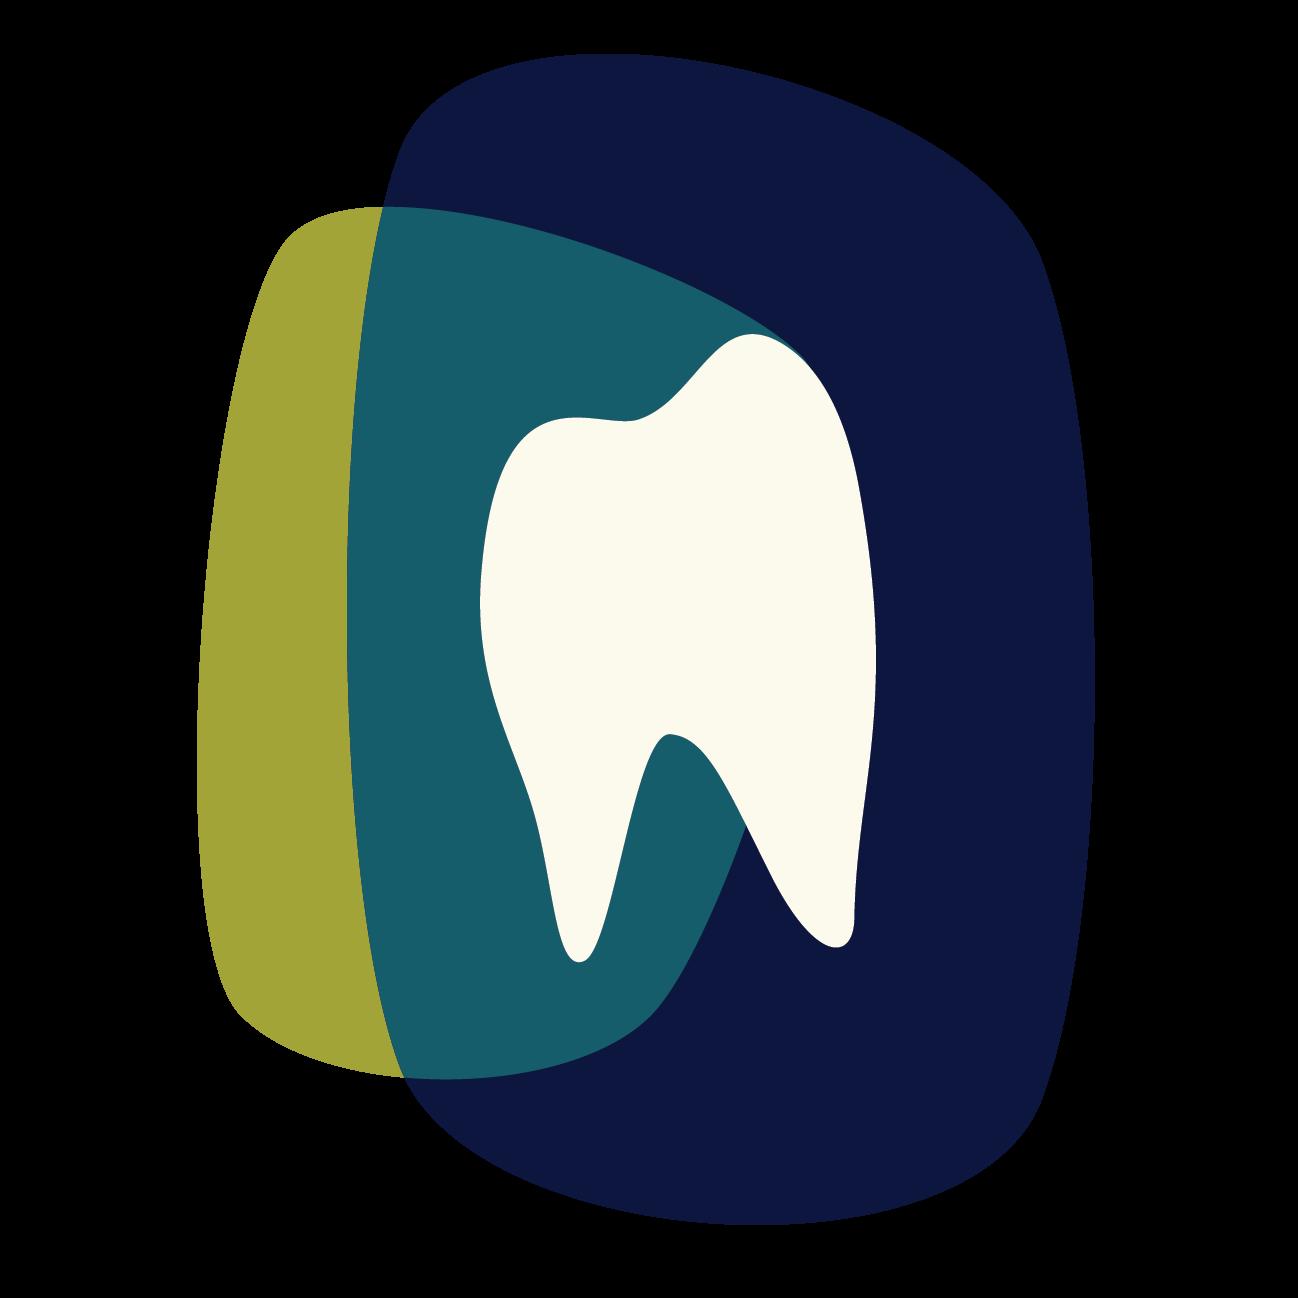 Gleam logo icon